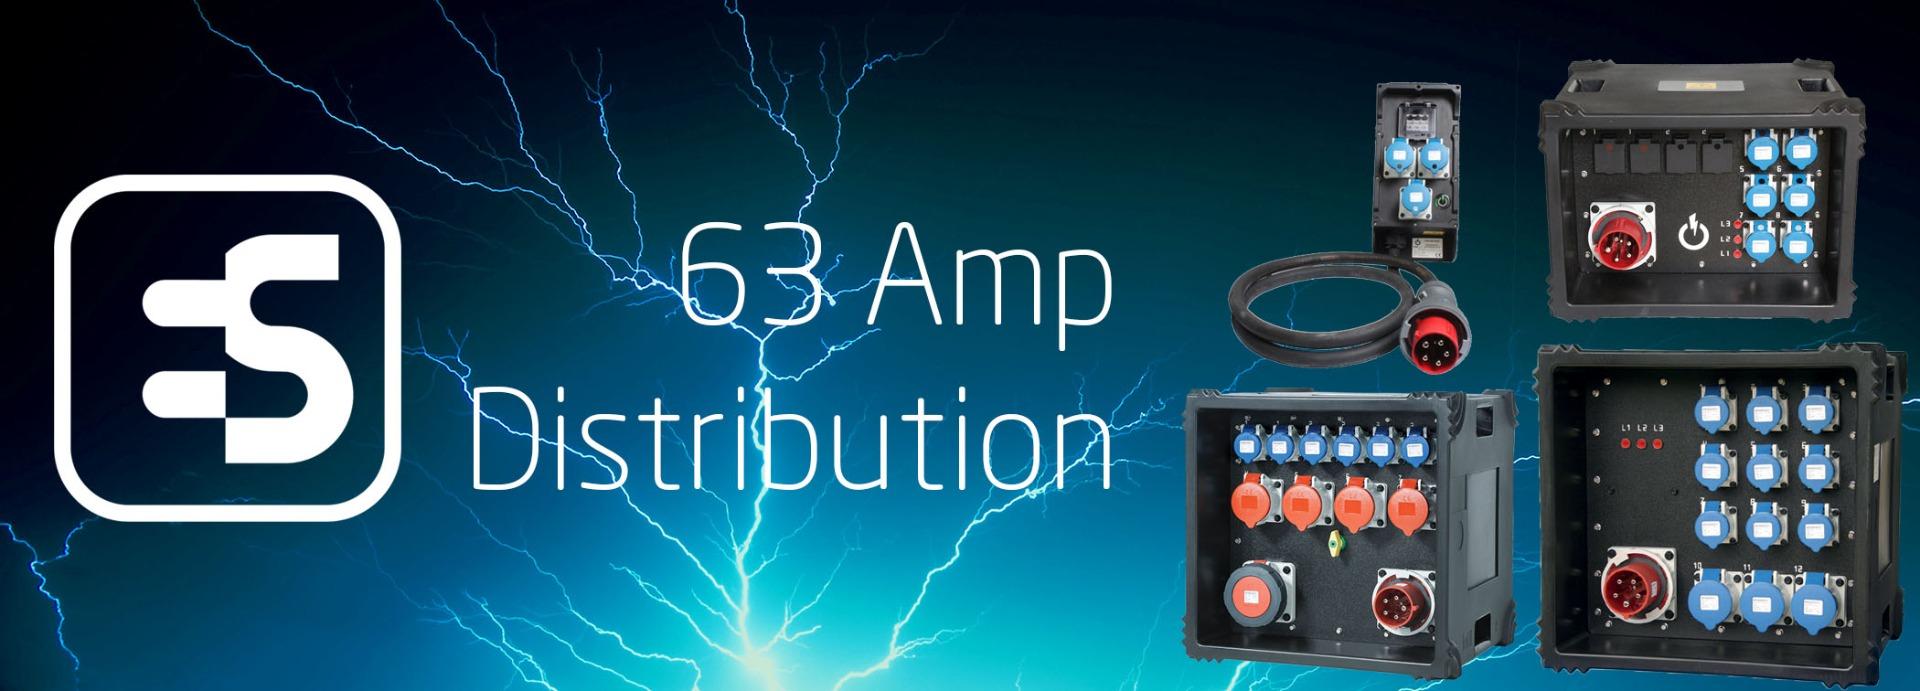 63 Amp Distribution Boards